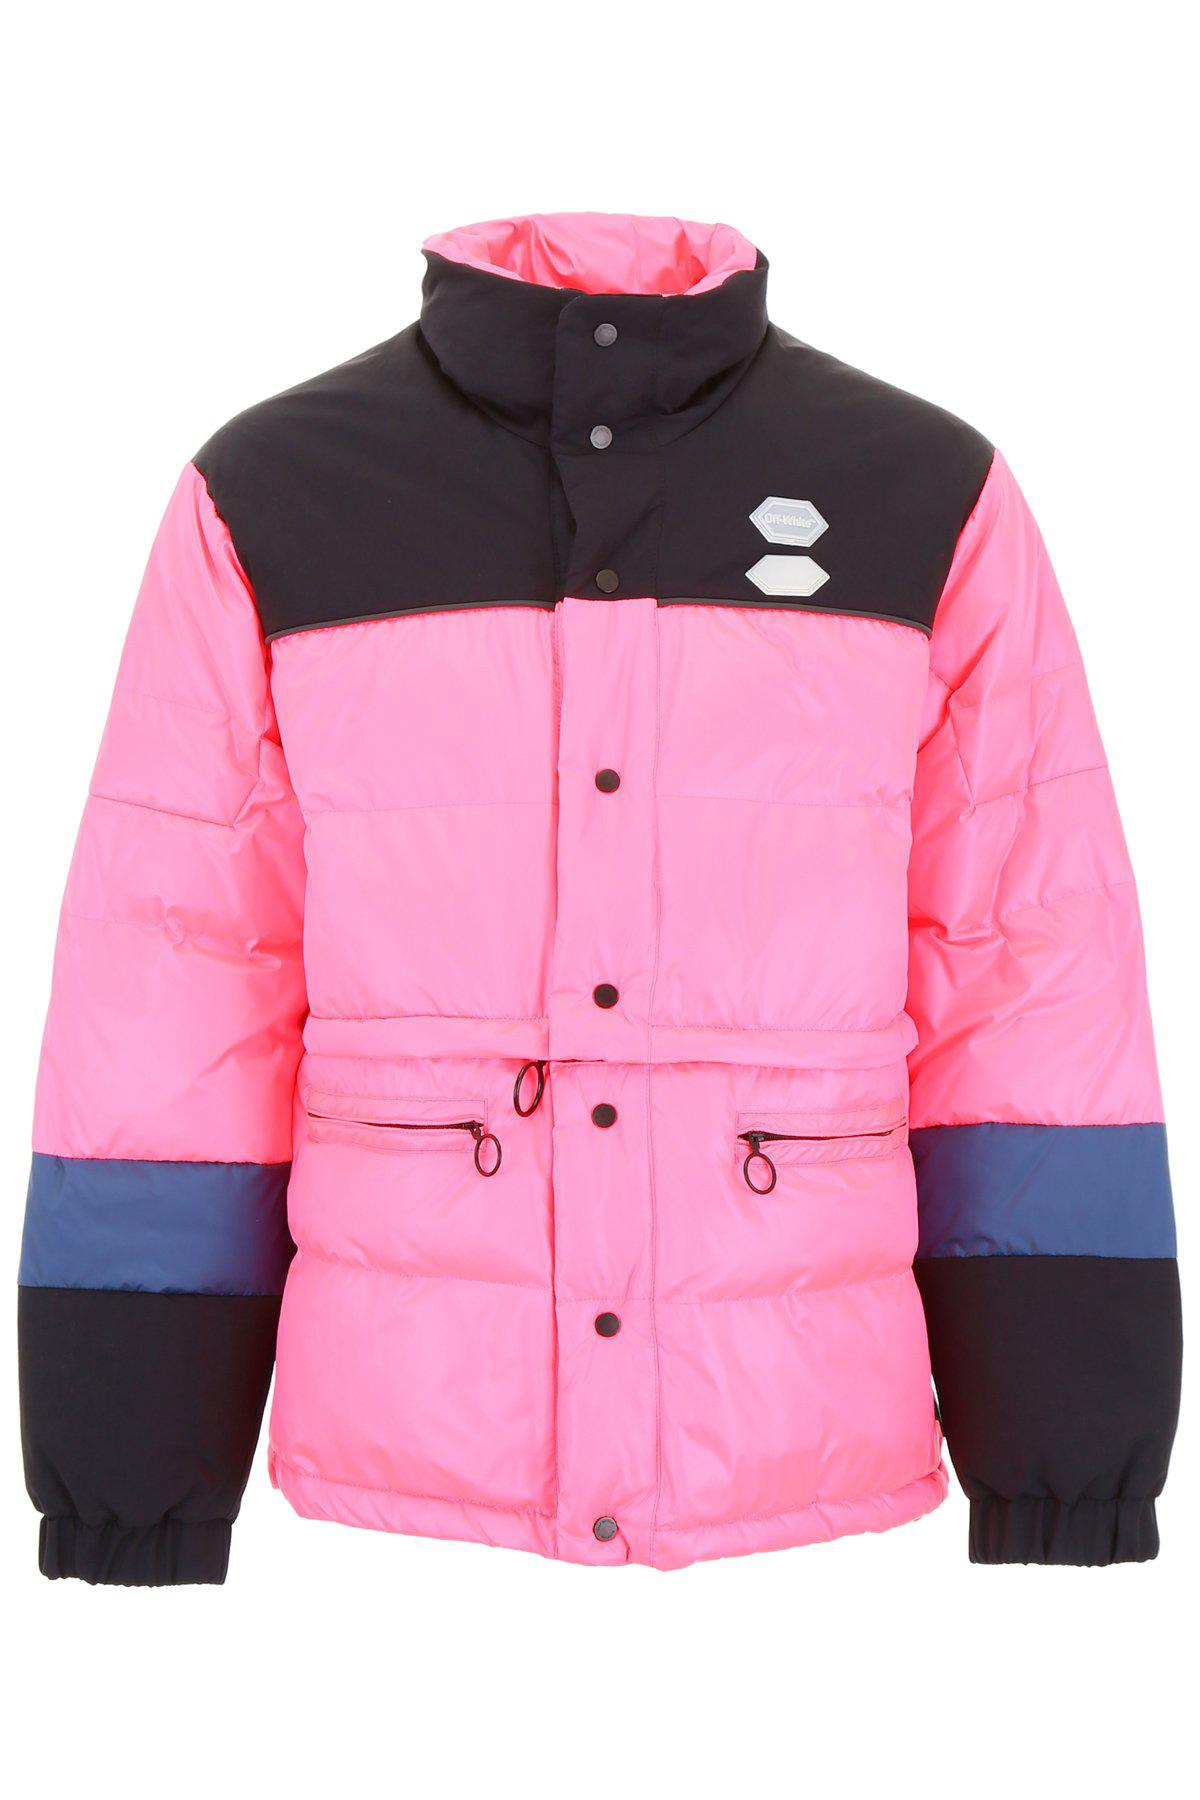 2e3f7cb479ecf Lyst - Off-White c/o Virgil Abloh Bicolour Puffer Jacket in Pink for Men